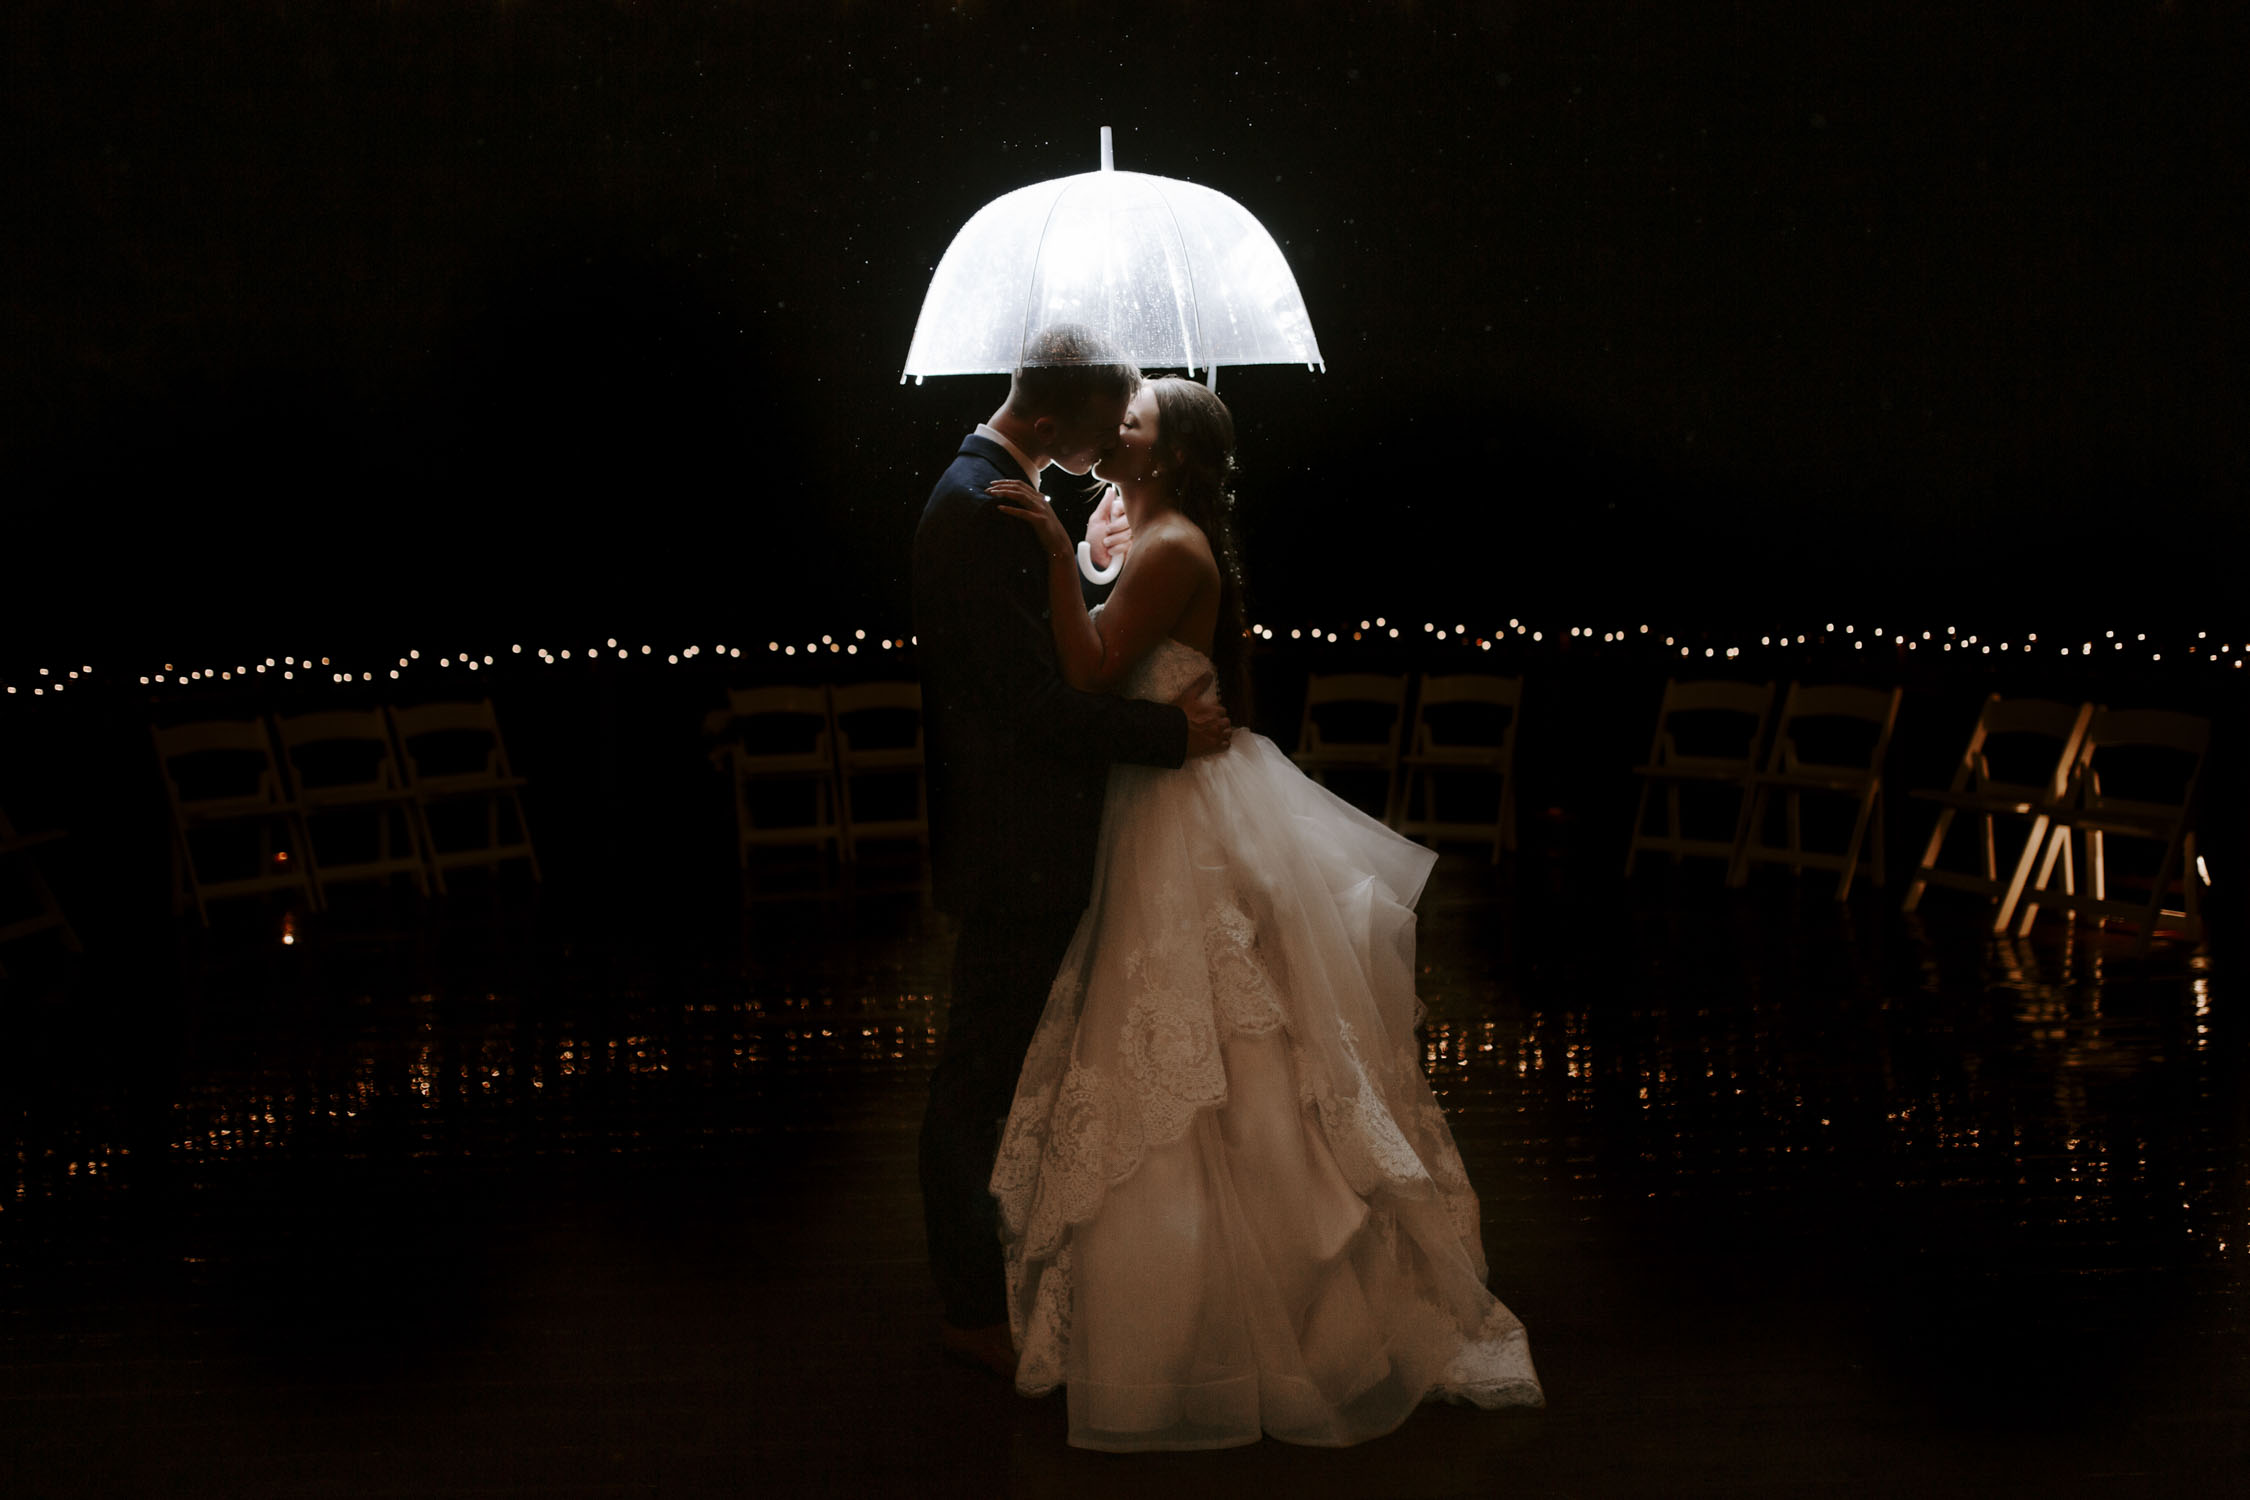 Rainy Bella Collina Wedding | Bride and Groom artistic flash portraits by Kayli LaFon Photography, Greensboro Winston-Salem, NC Wedding Photographer